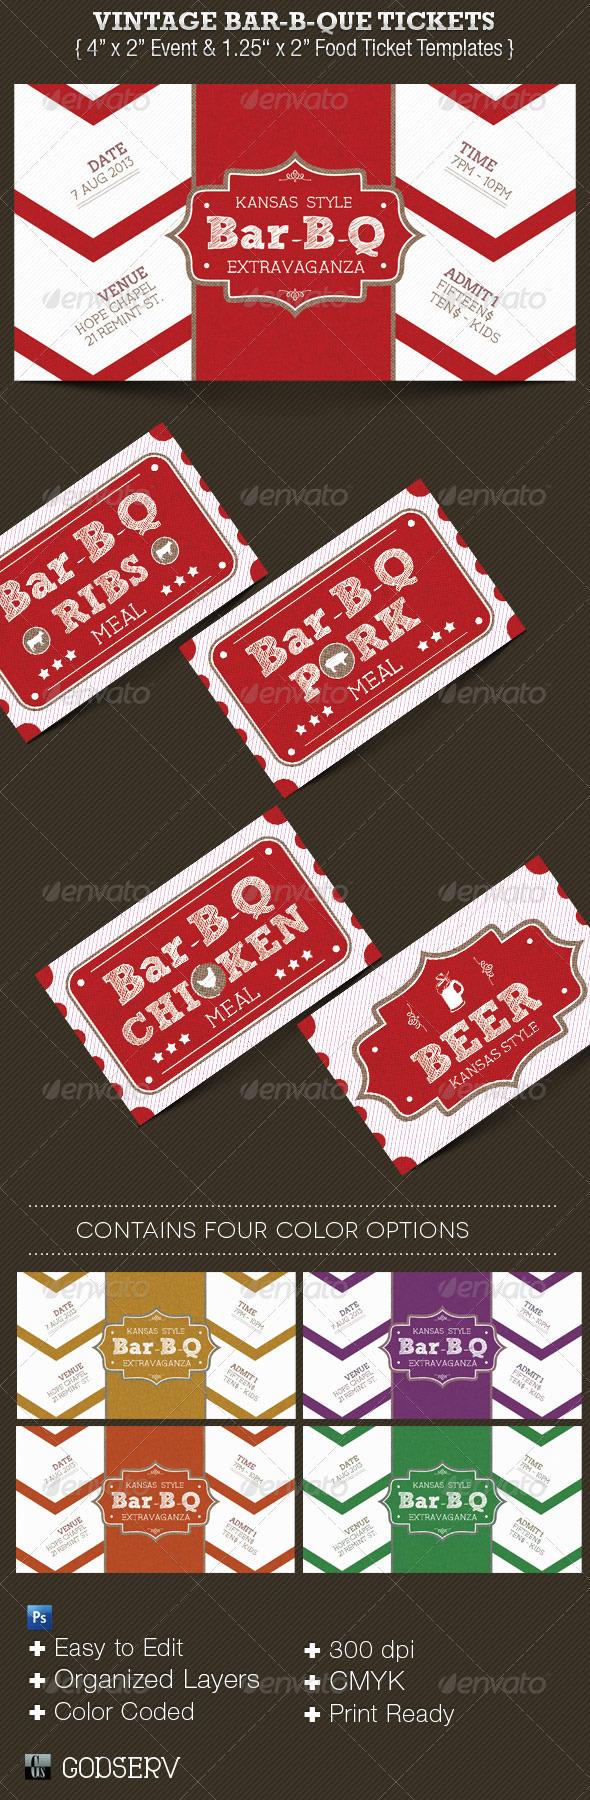 GraphicRiver Vintage Bar-B-Que Ticket Template Set 3692696